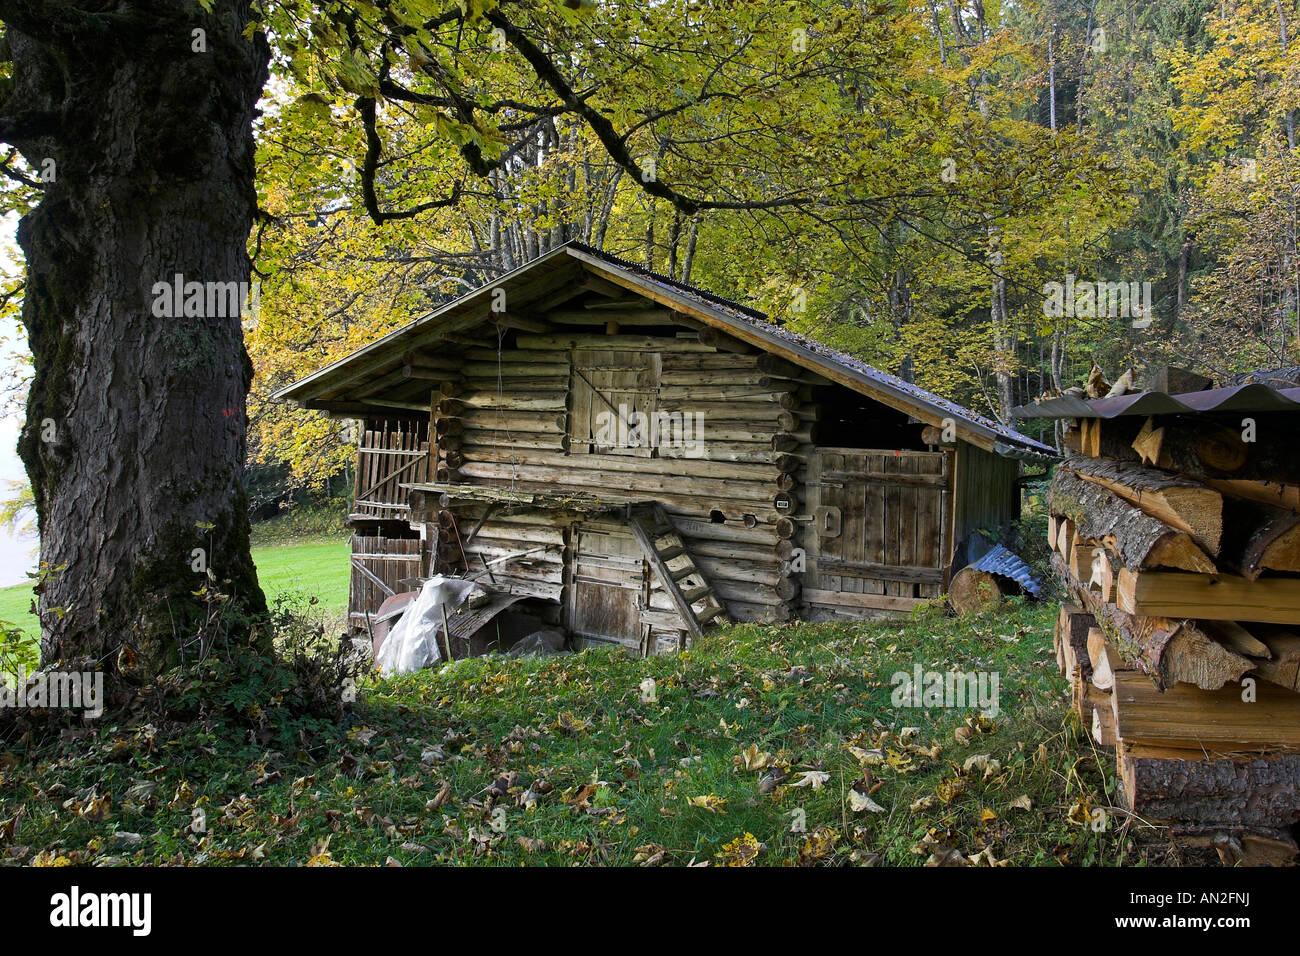 Almhuette Herbst Schweiz Berner Oberland Switzerland swiss Alps europe Stock Photo